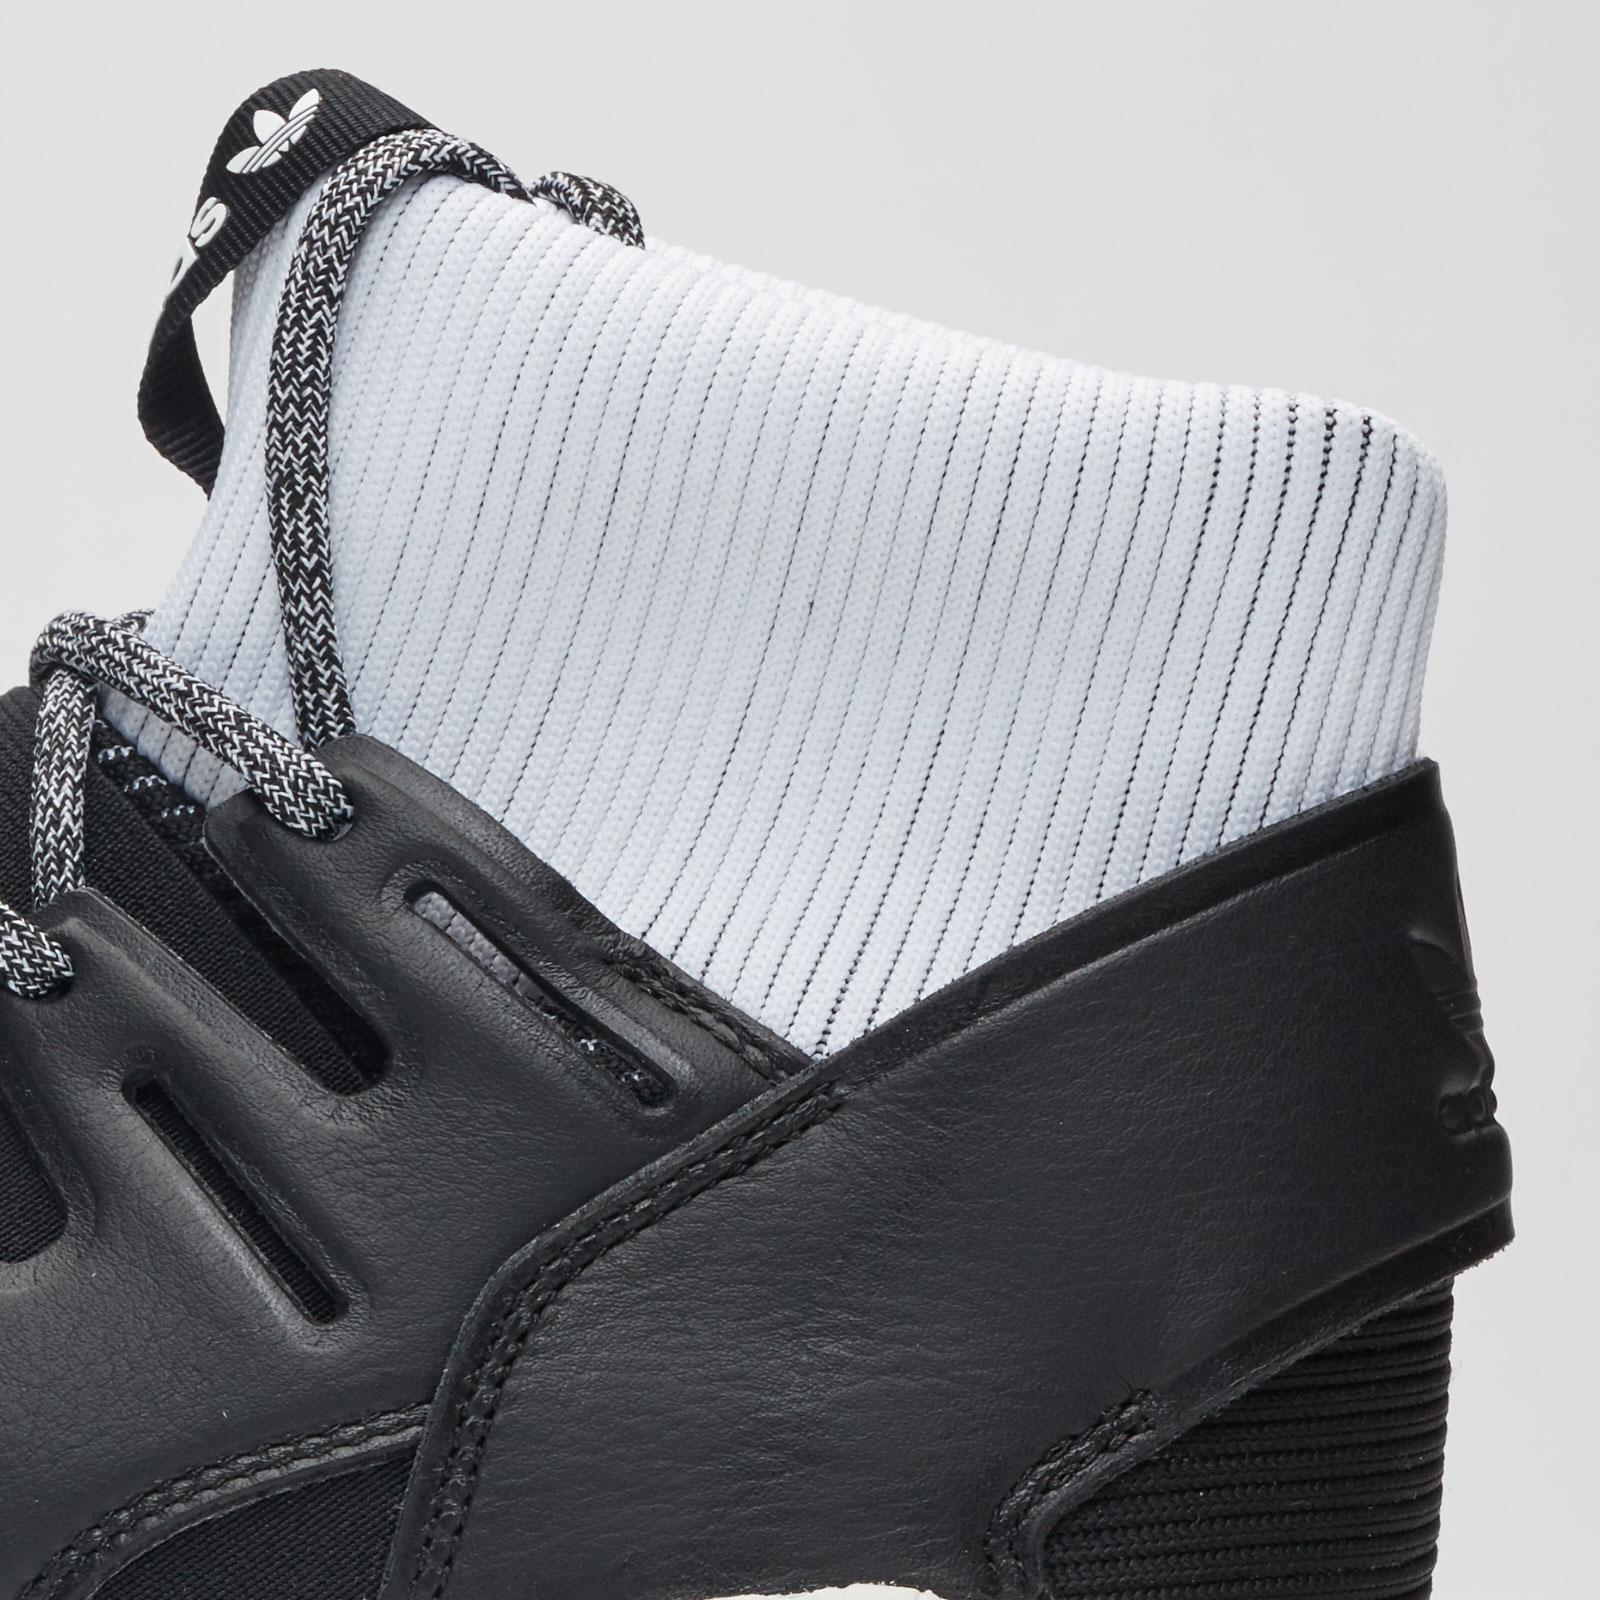 brand new 41e35 245bd adidas Tubular Doom - Ba7555 - Sneakersnstuff | sneakers ...